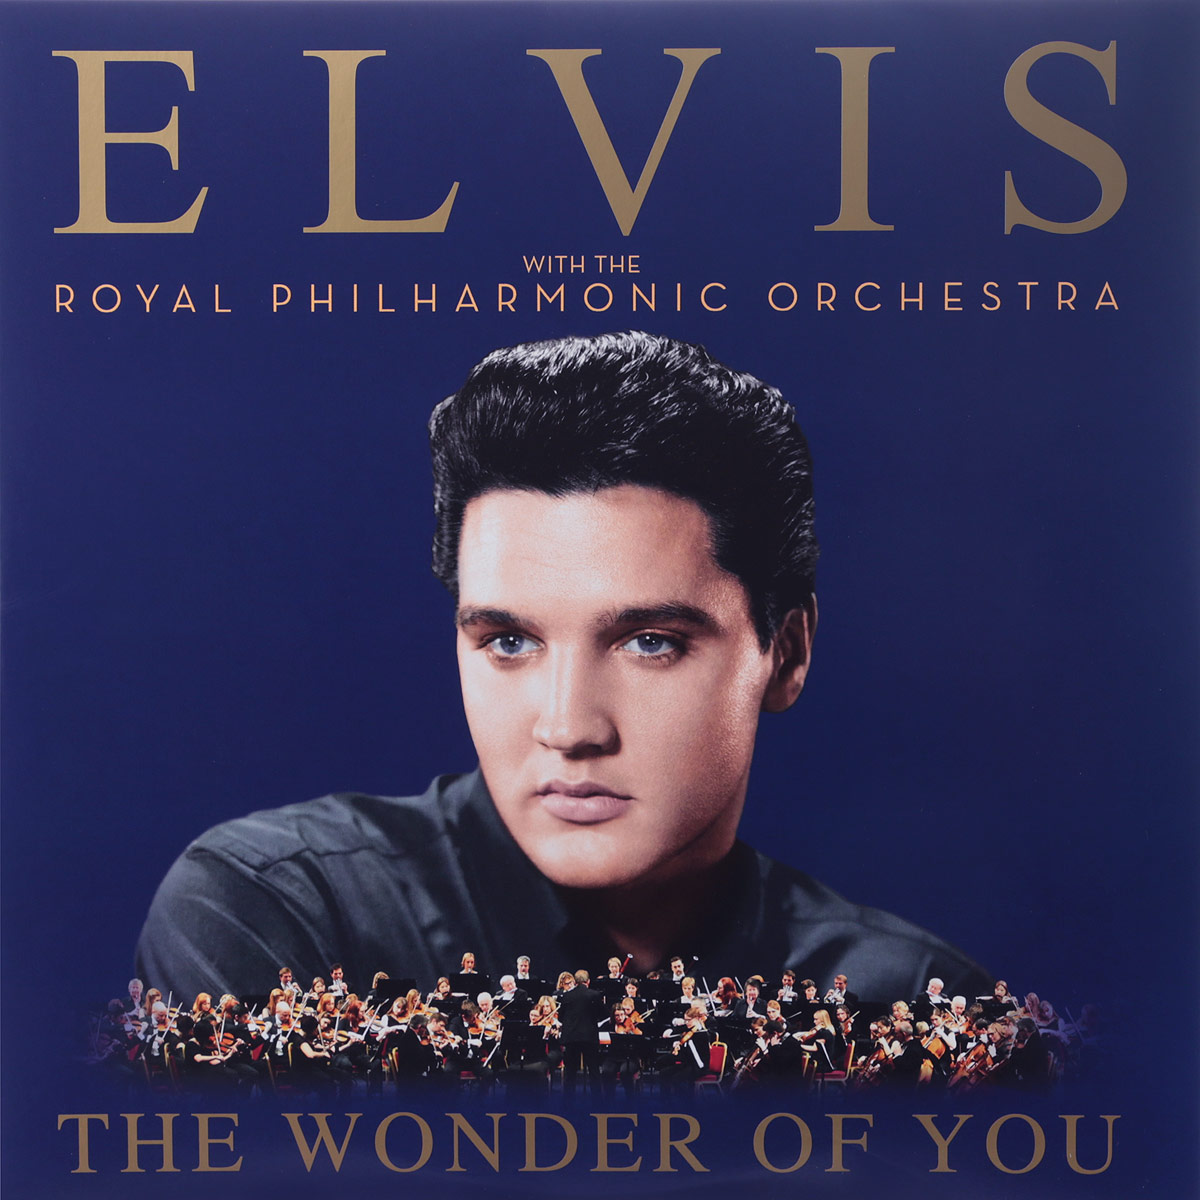 Элвис Пресли,The Royal Philharmonic Orchestra Elvis Presley With The Royal Philharmonic Orchestra. The Wonder Of You (2 LP) royal philharmonic orchestra the planets